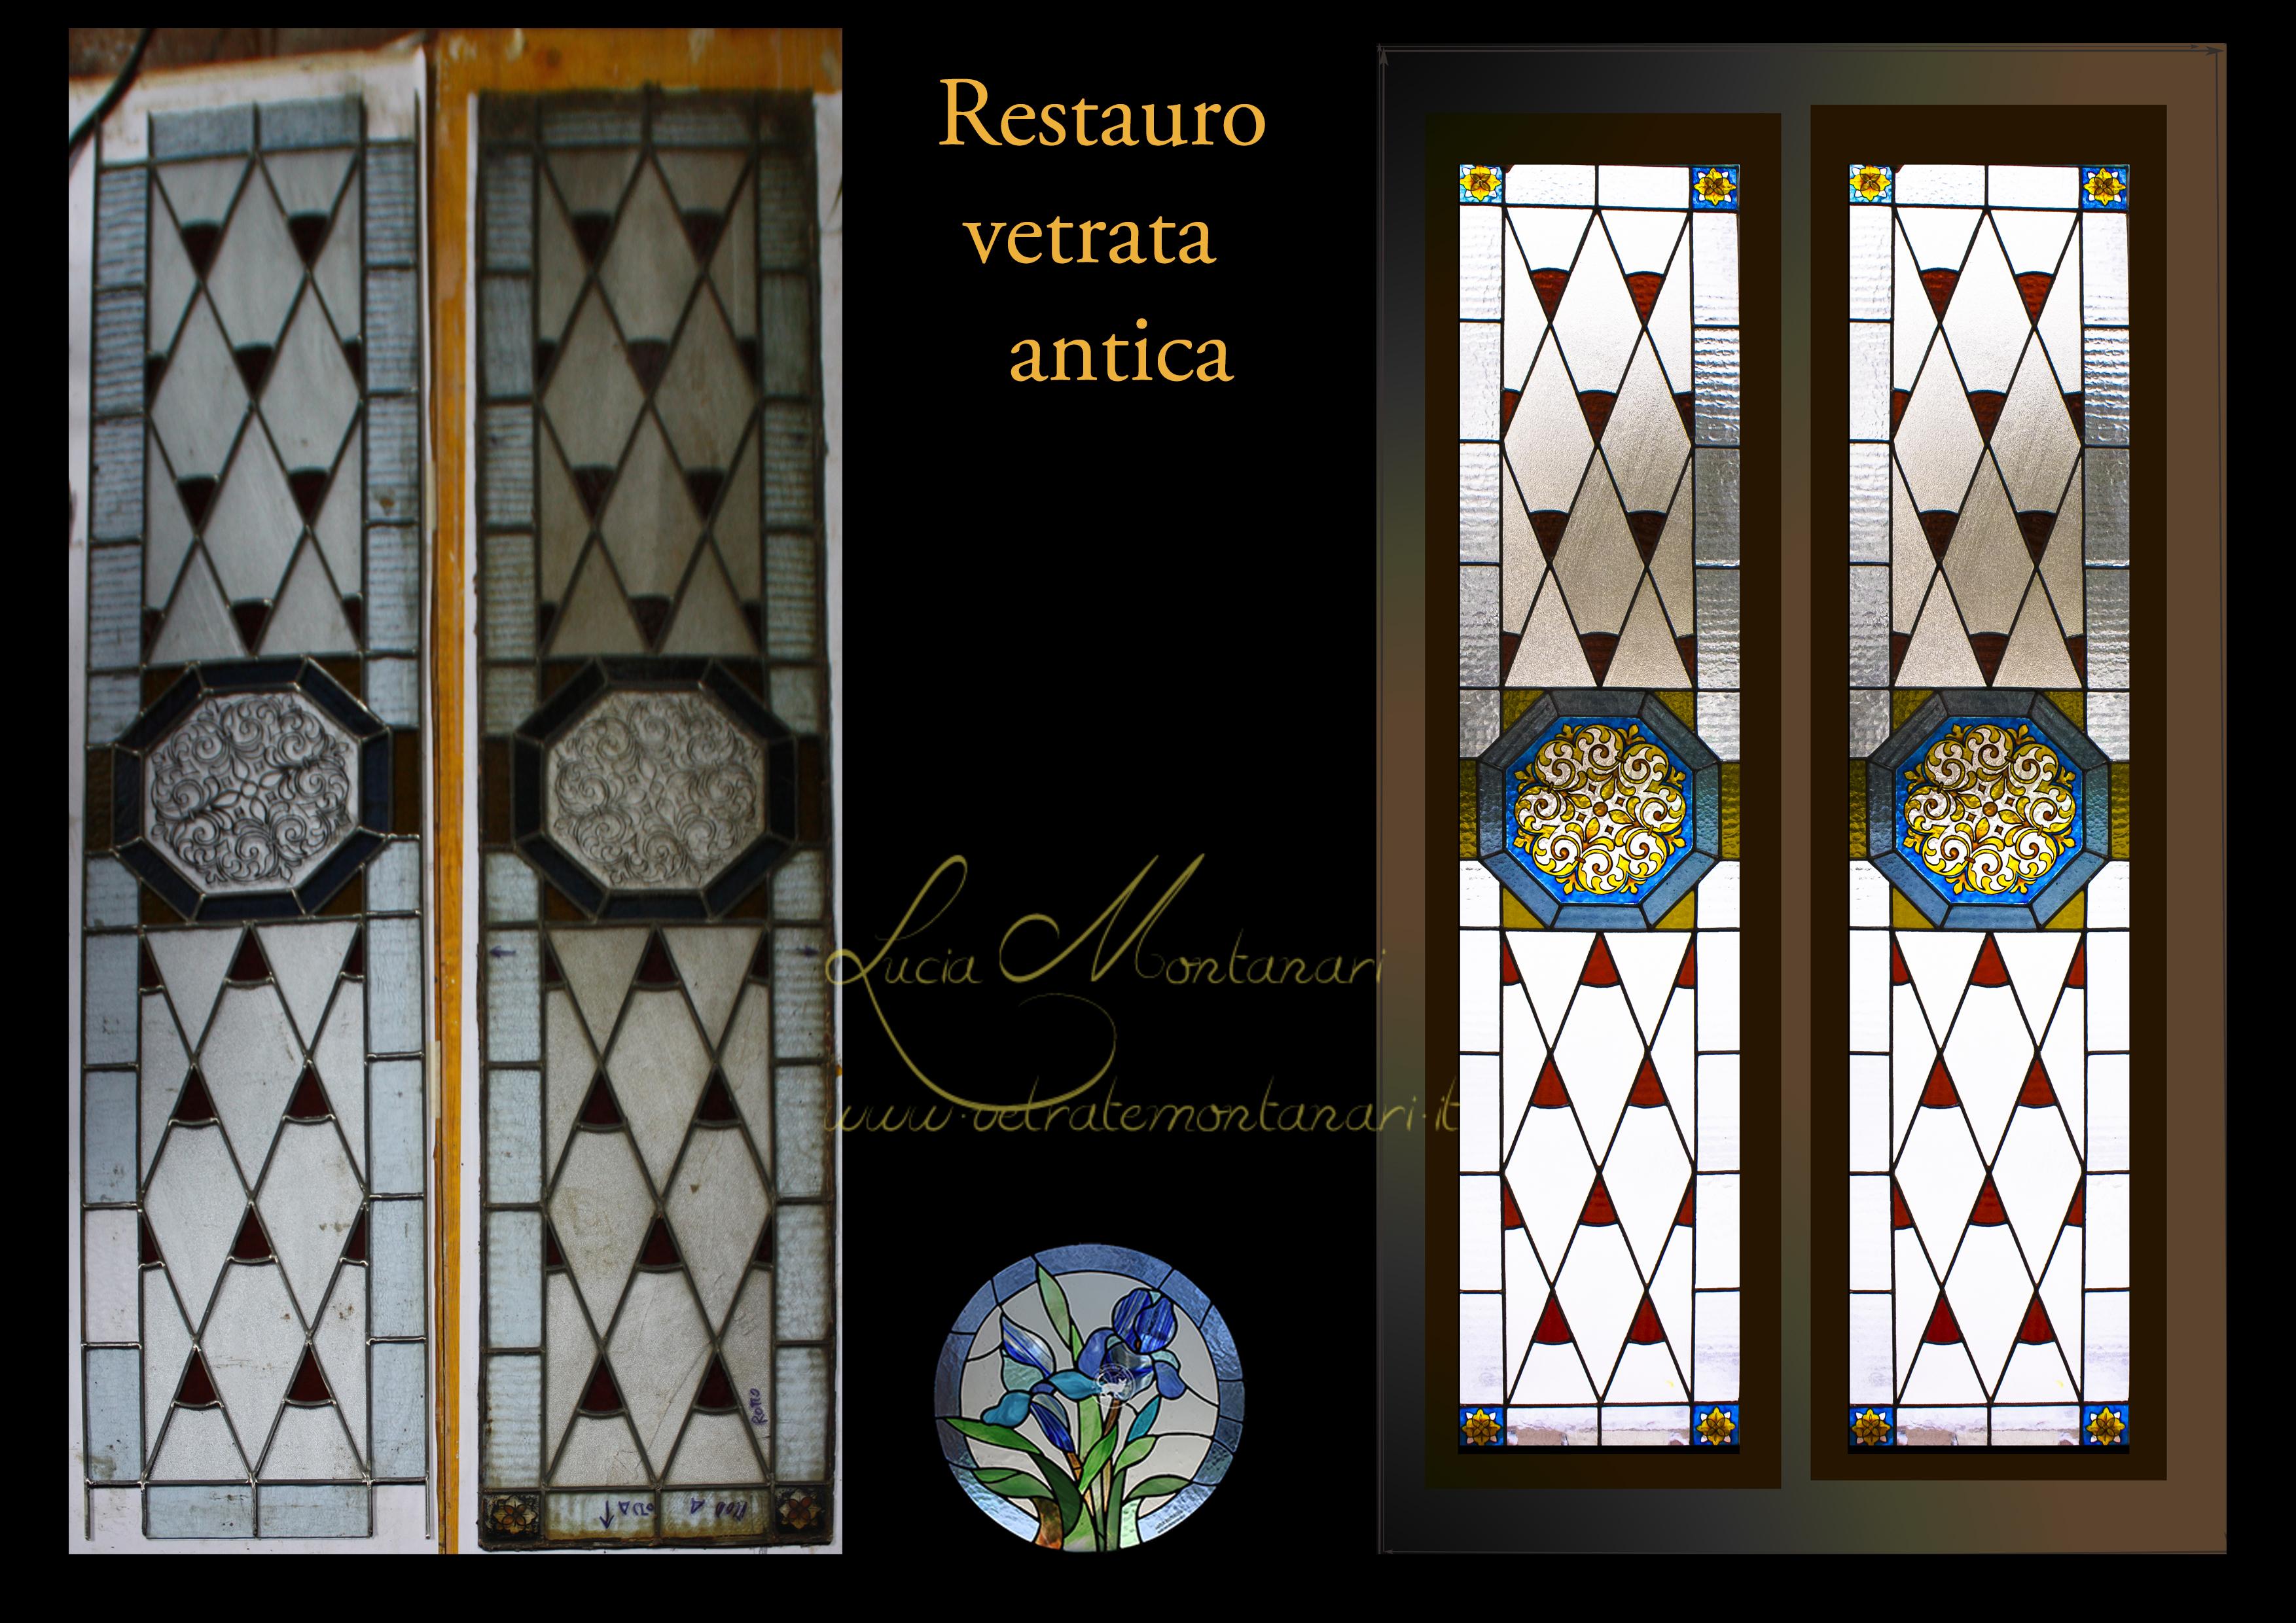 vetrata antica restaurata